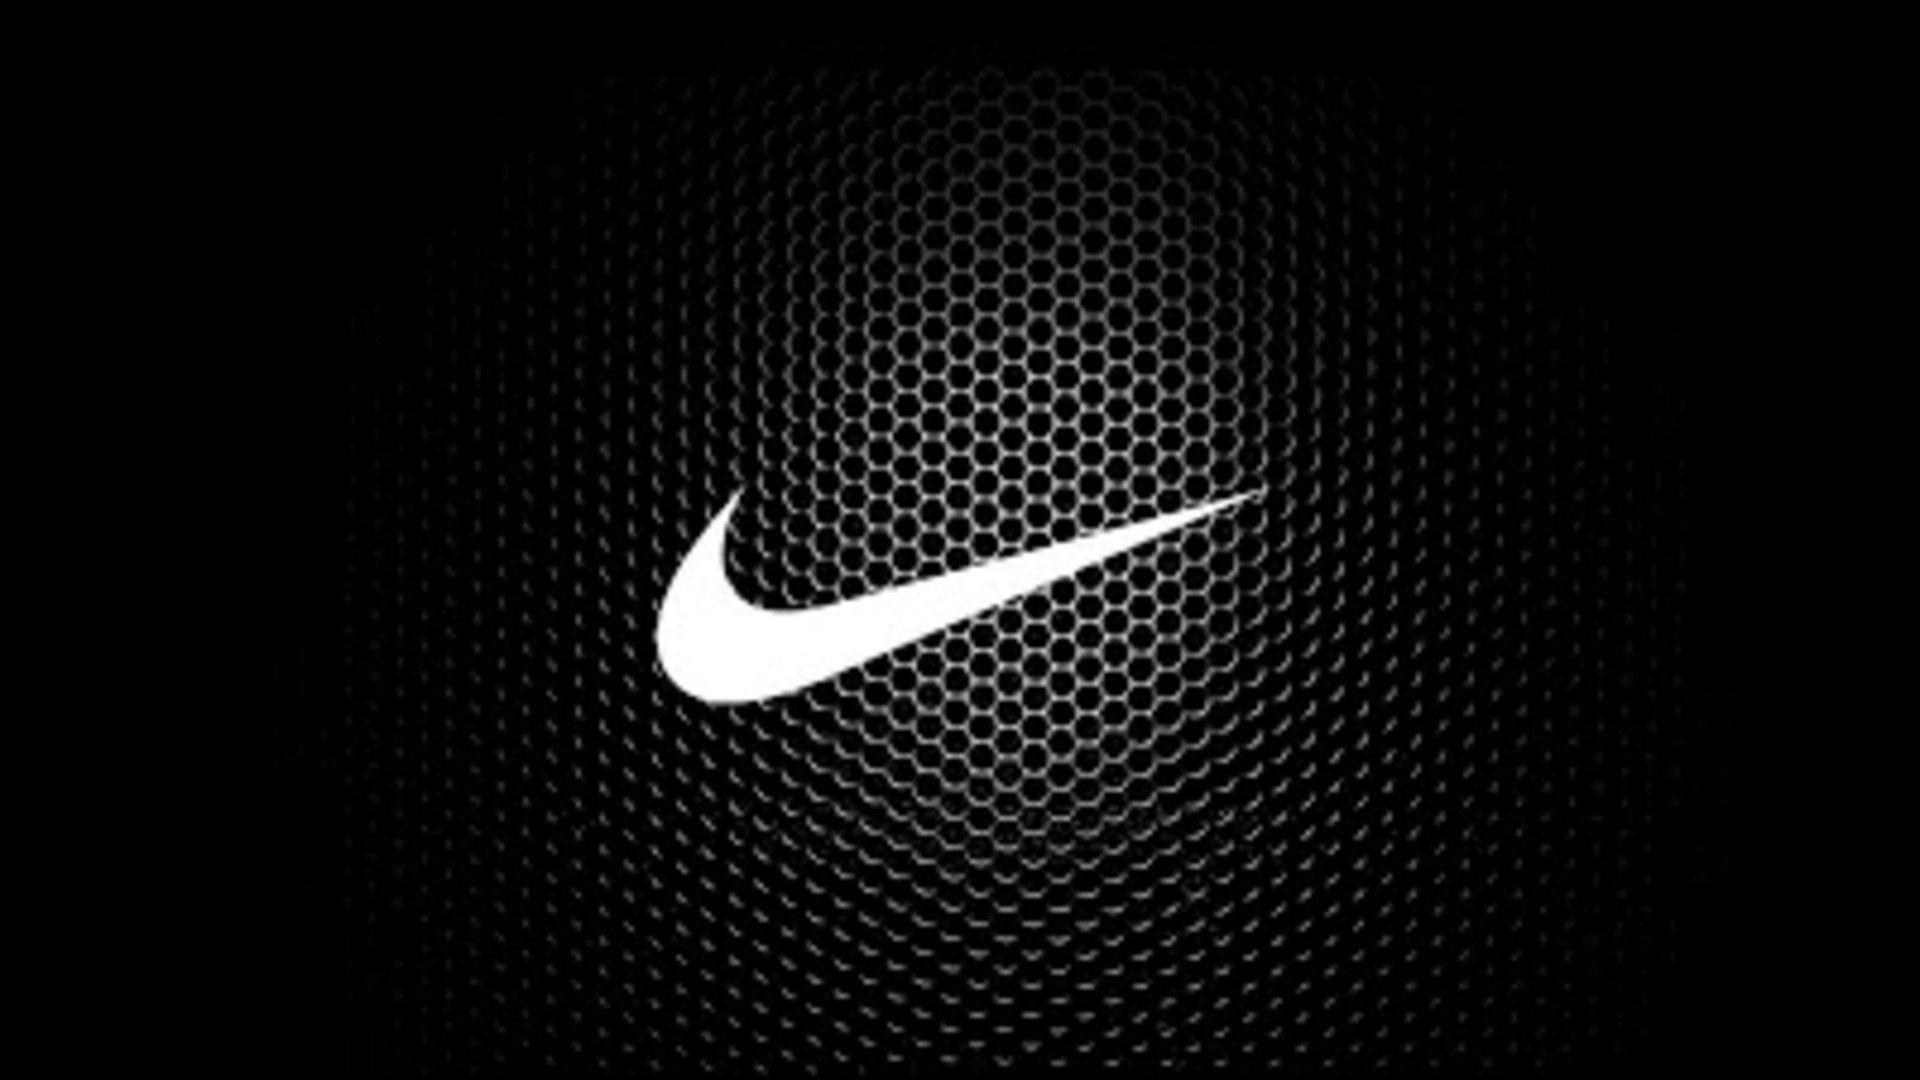 Nike Black Wallpaper 8820811